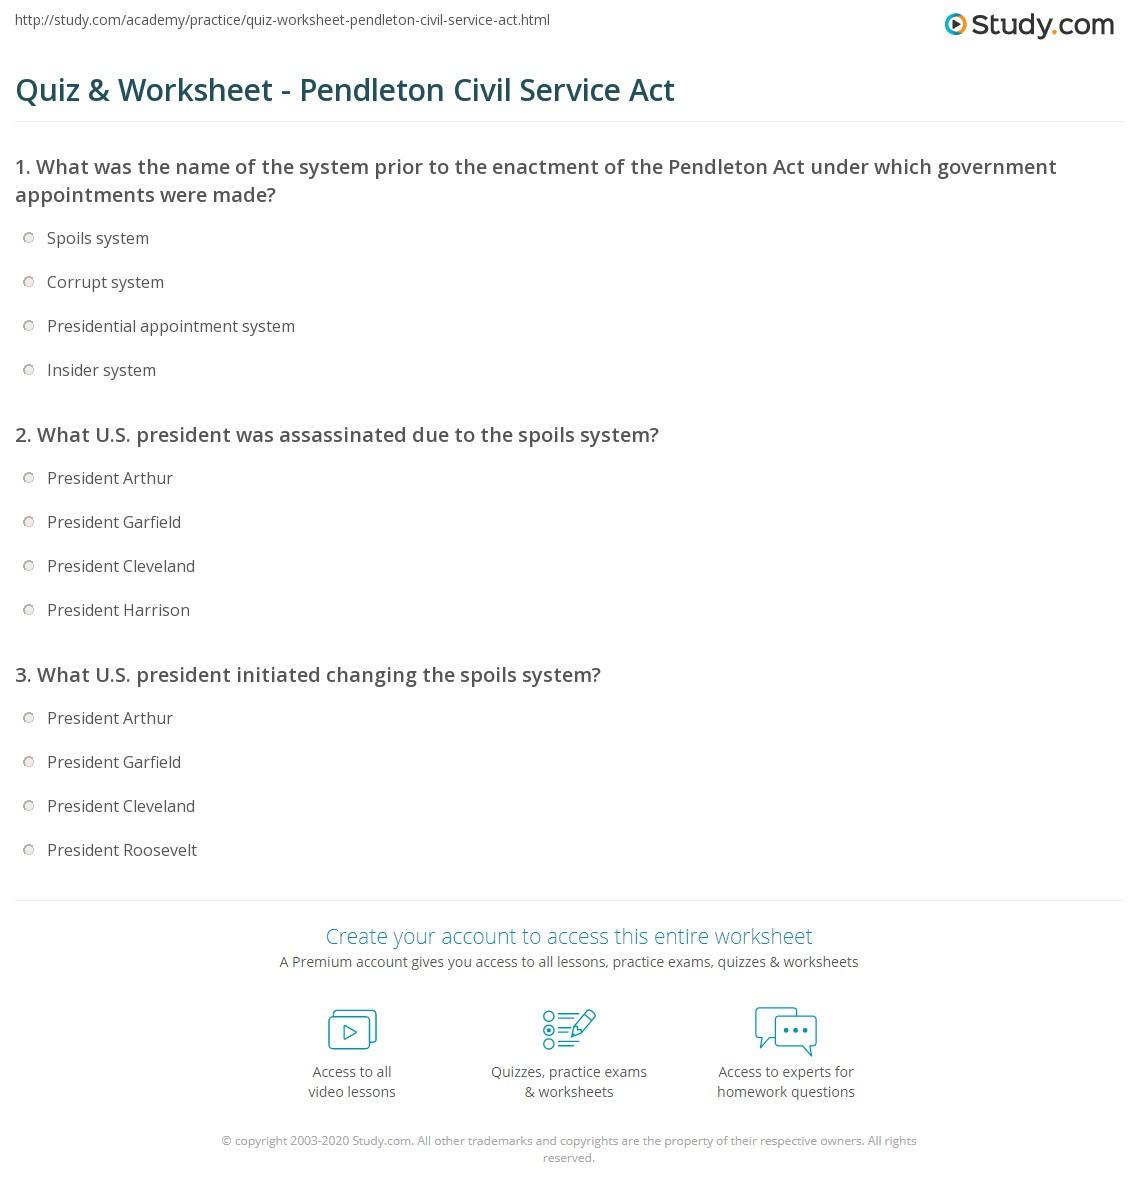 quiz worksheet pendleton civil service act study com print pendleton civil service act definition summary worksheet